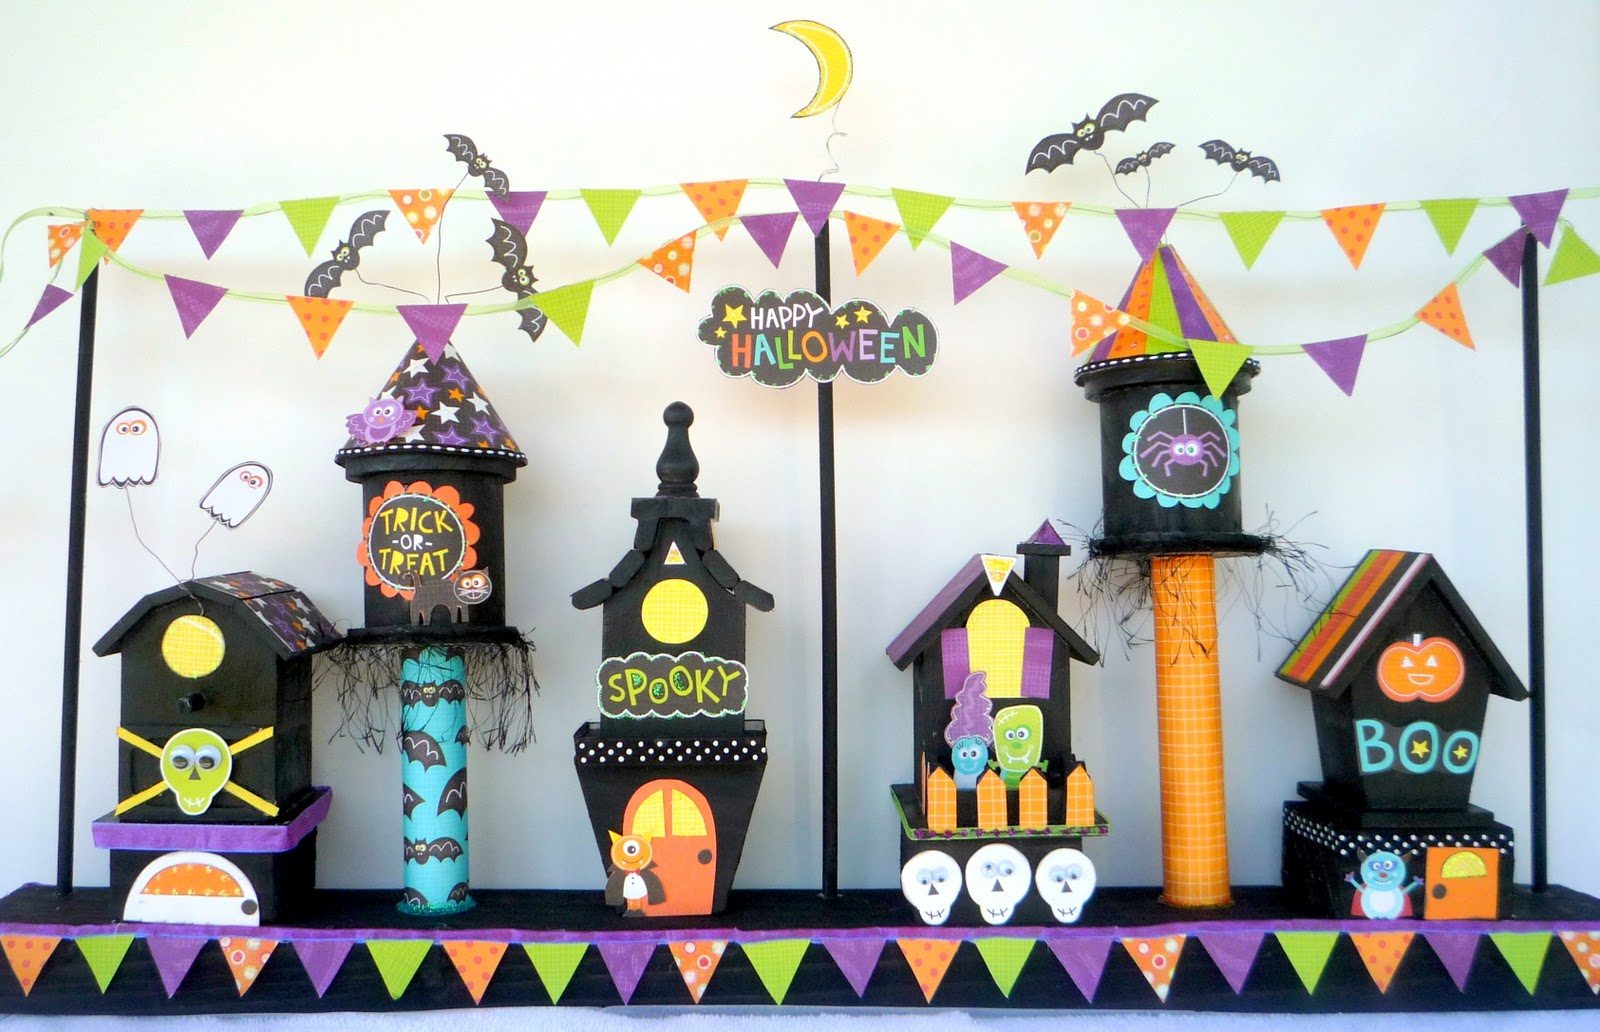 http://3.bp.blogspot.com/_d-0RmmAdars/TMi_SMWpR1I/AAAAAAAACiU/qMLZa9SVZjQ/s1600/haunted+house+1.jpg